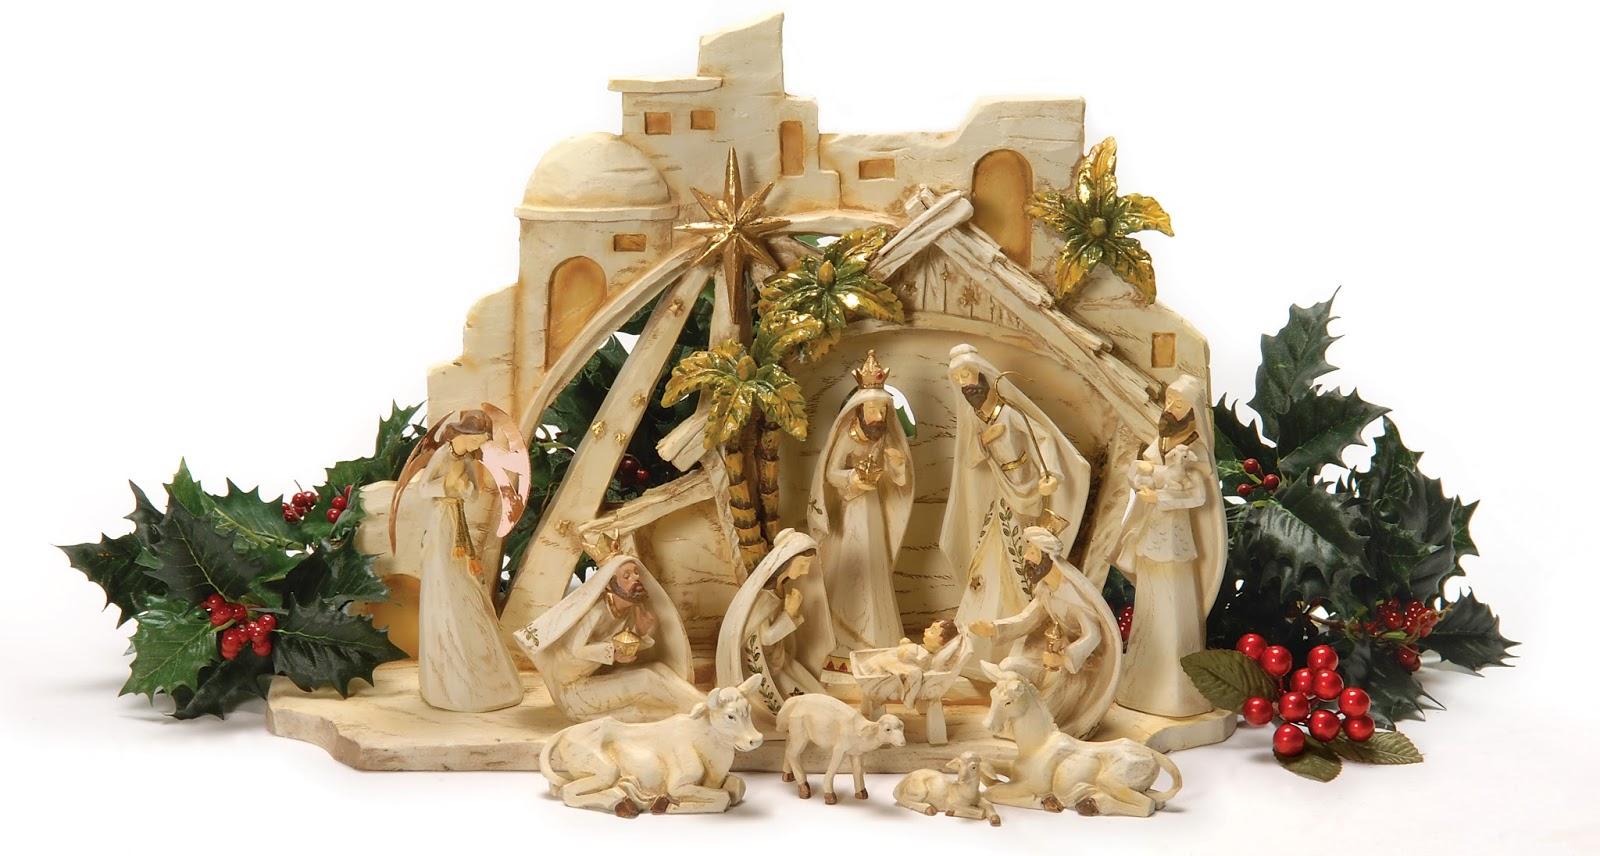 Dearmyrtle S Genealogy Blog Blog Caroling Mary Did You Know